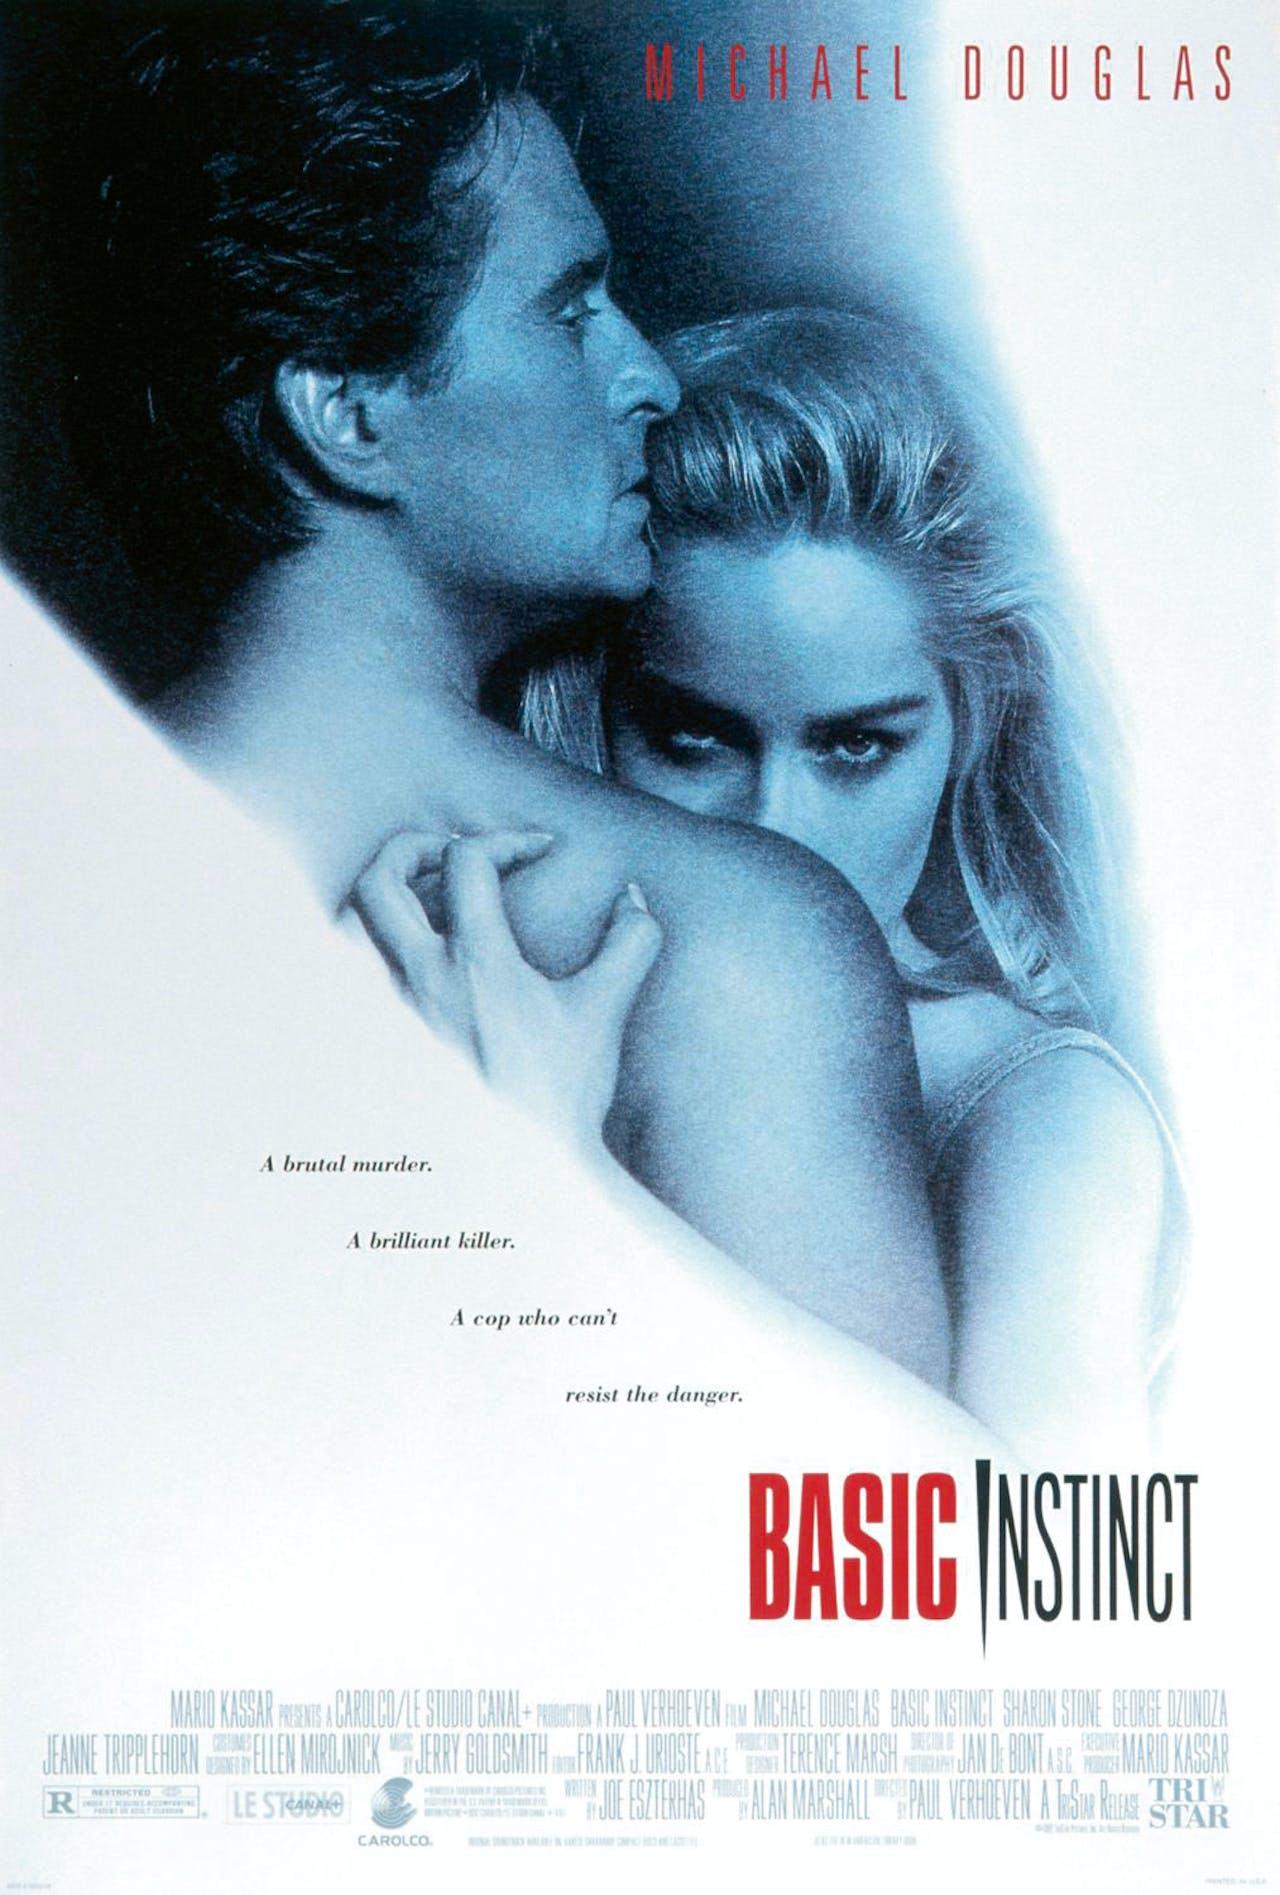 Basic Instinct (Paul Verhoeven, 1992) | Lotus Esprit SE